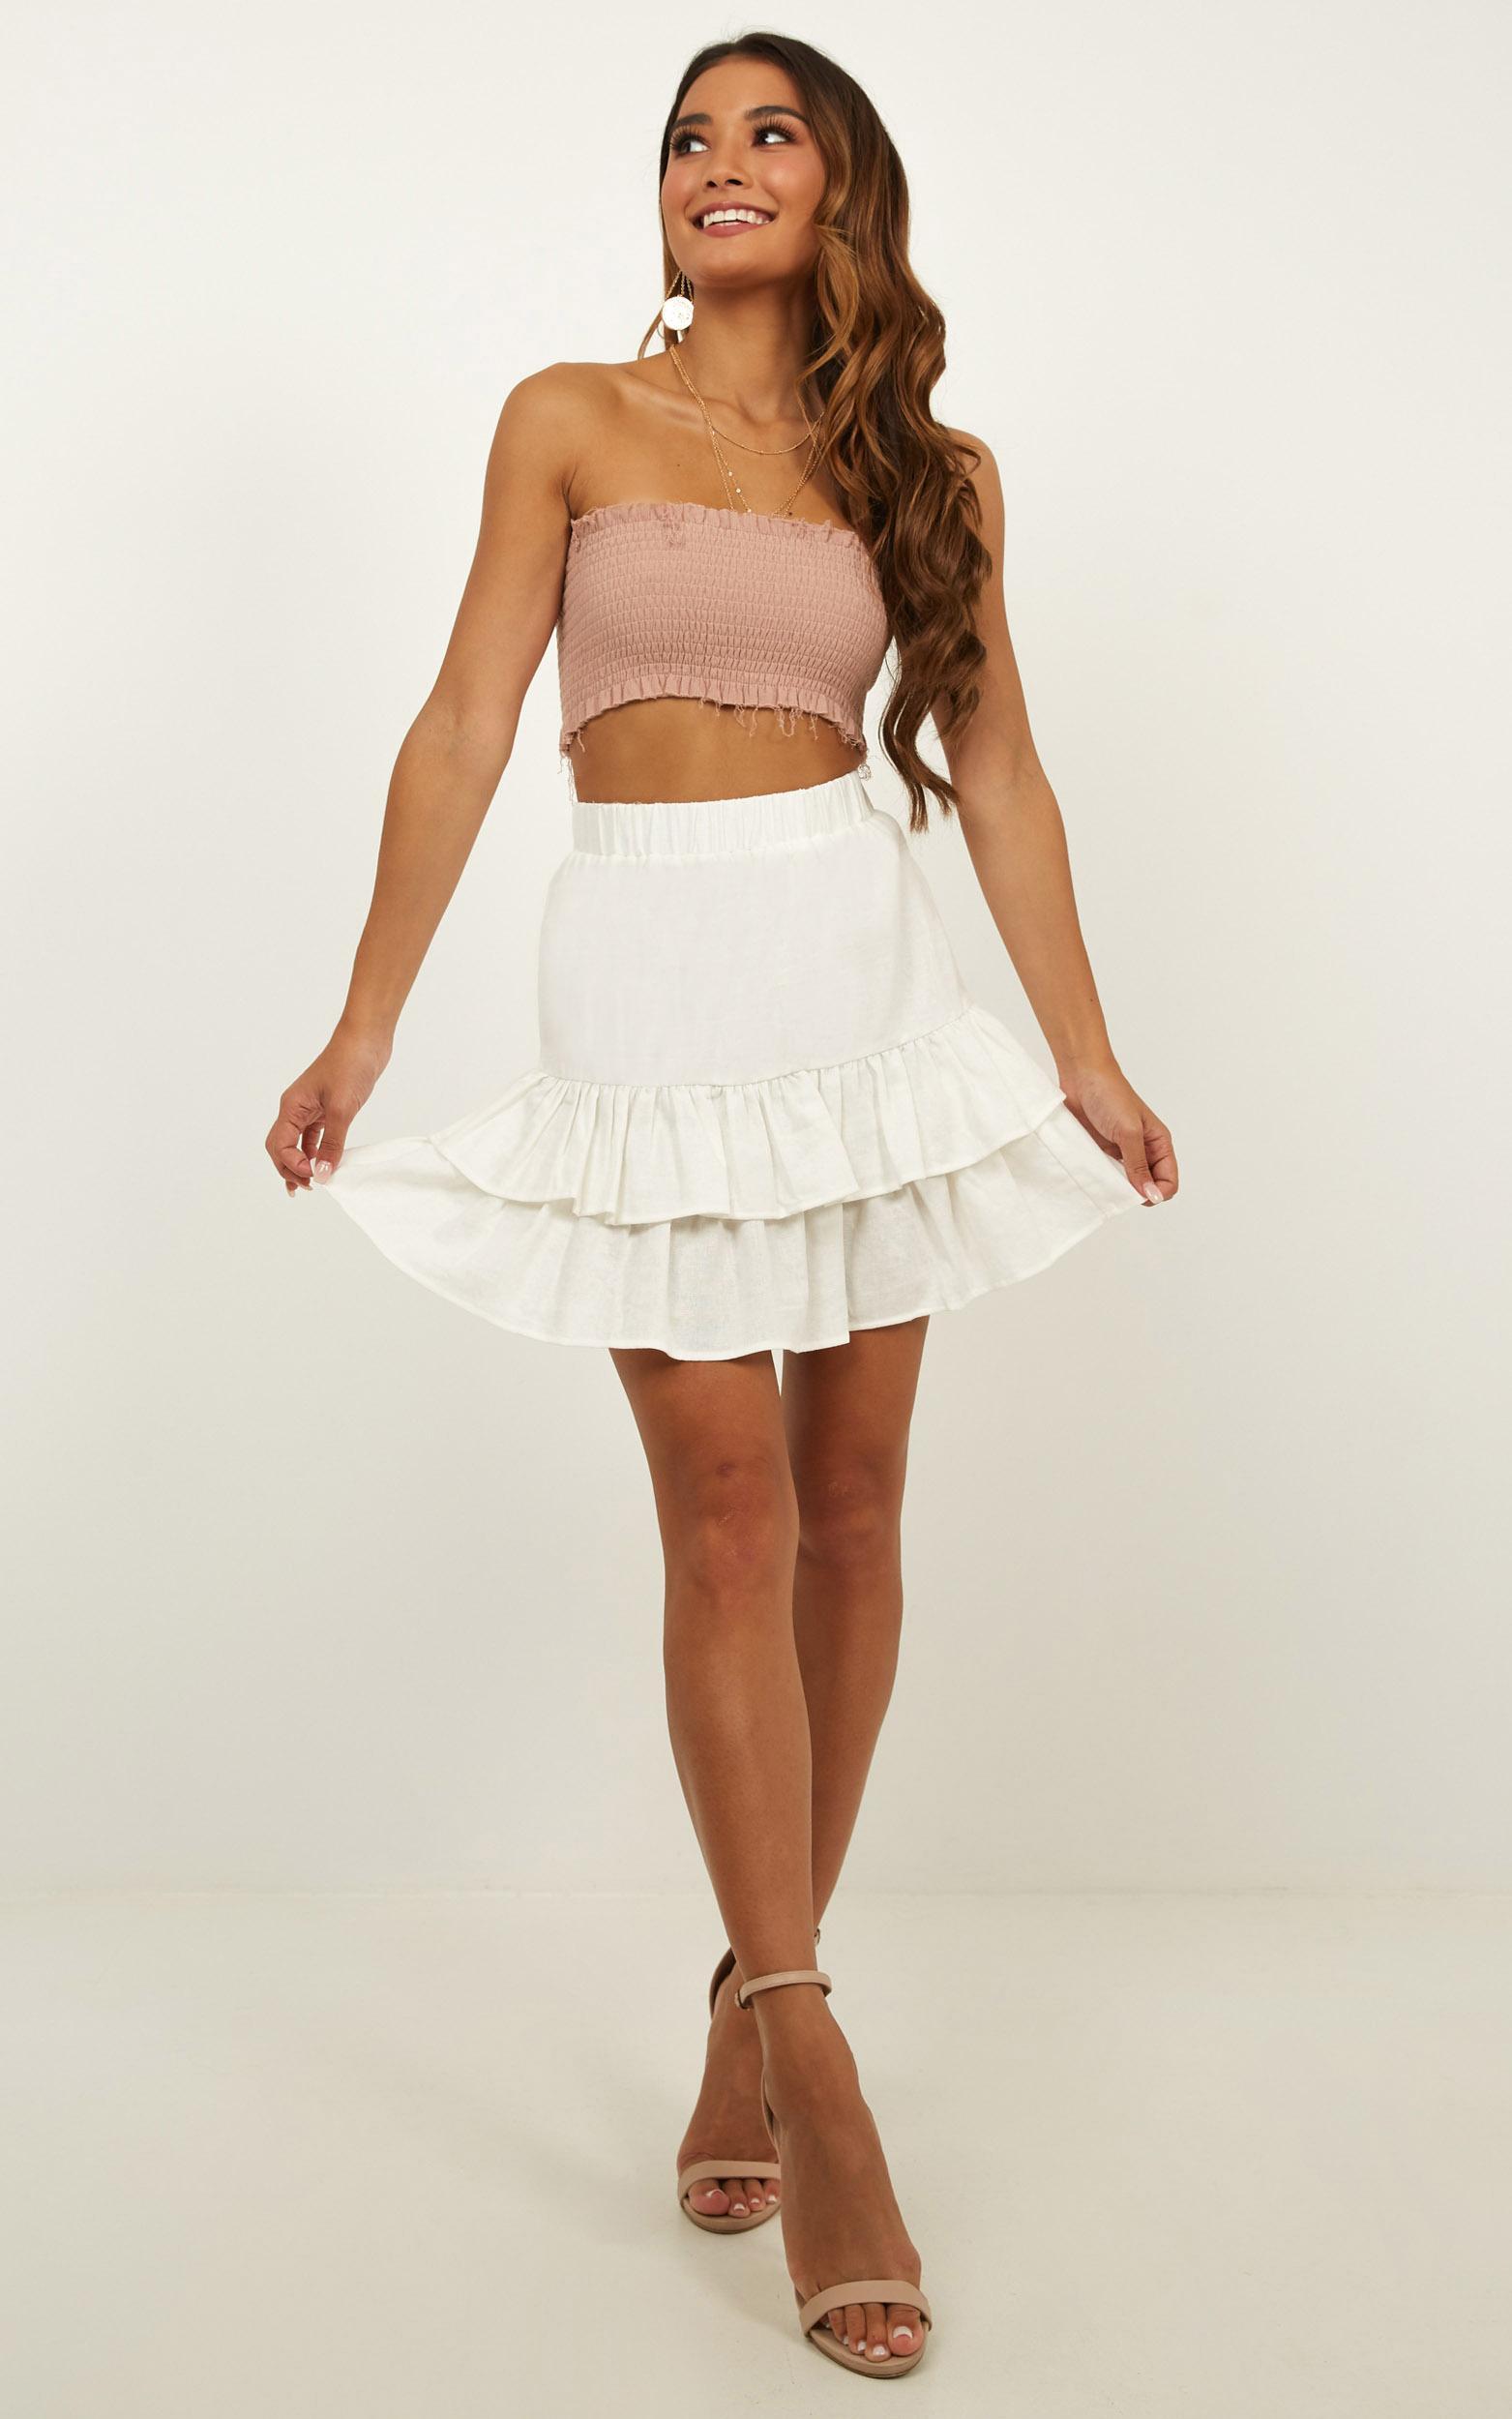 Spiteful Mission Skirt in white - 20 (XXXXL), White, hi-res image number null